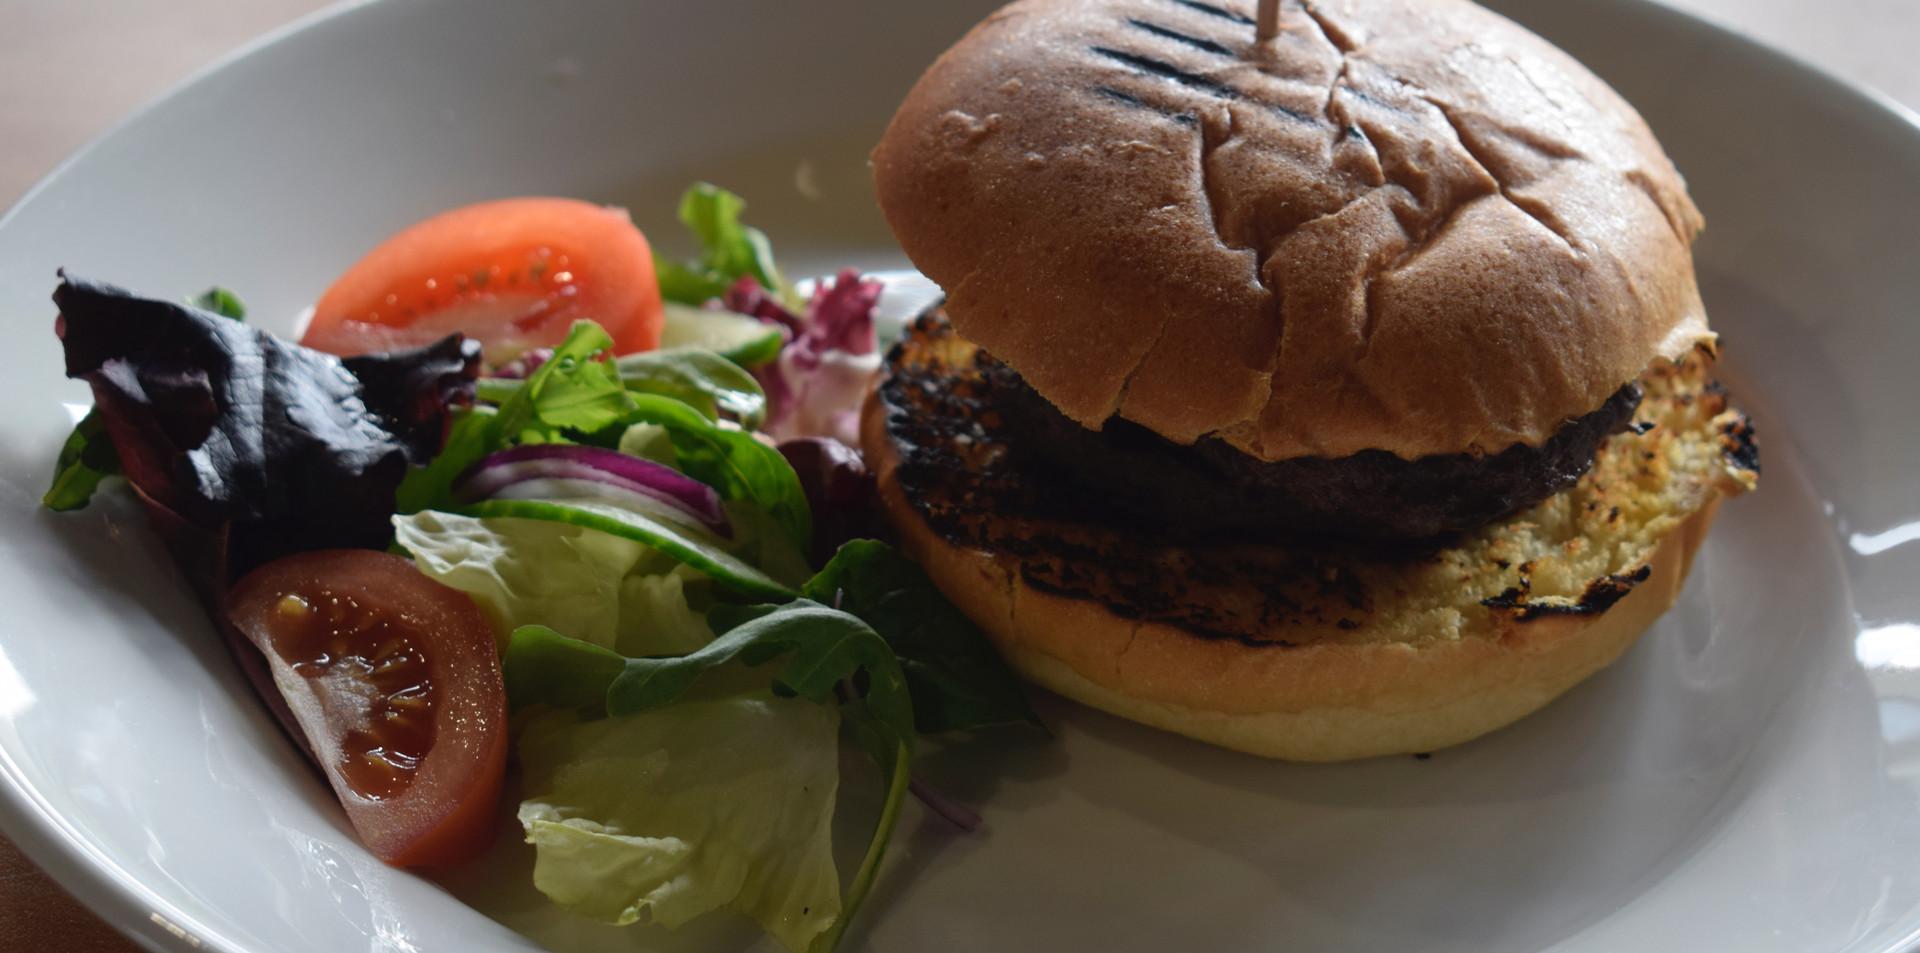 Big Maggie Burger - £4.00